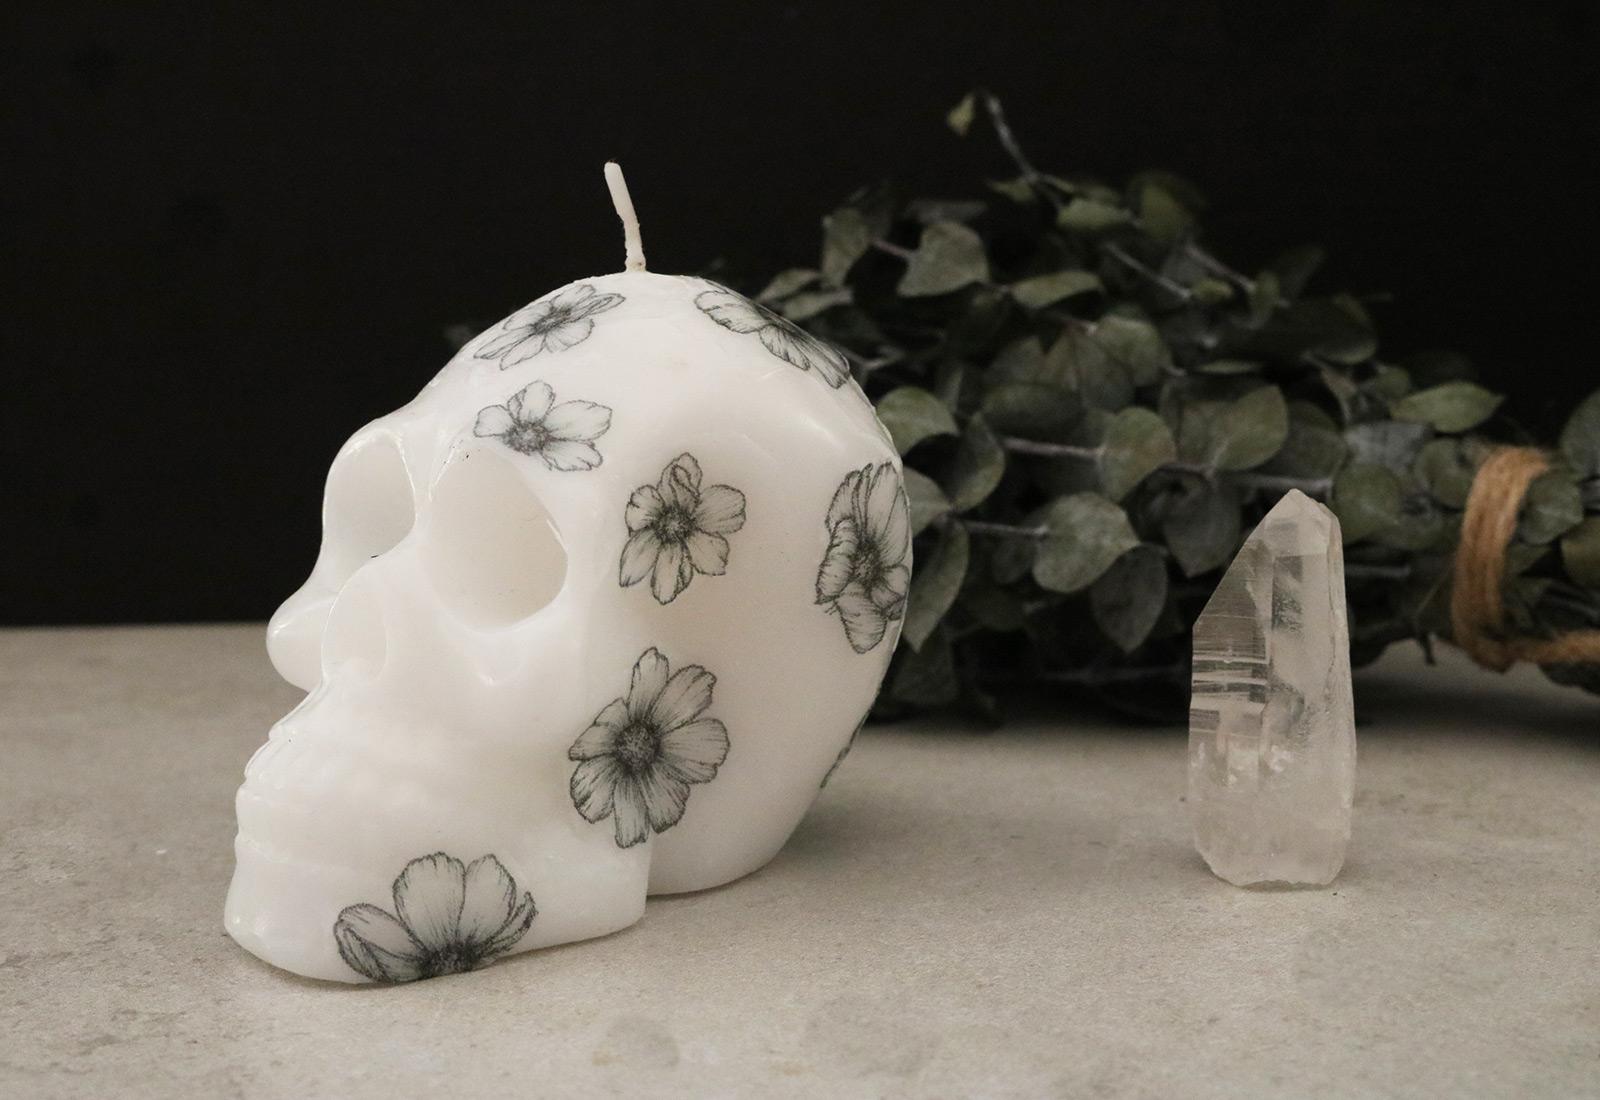 DIY Skull Floral Candle